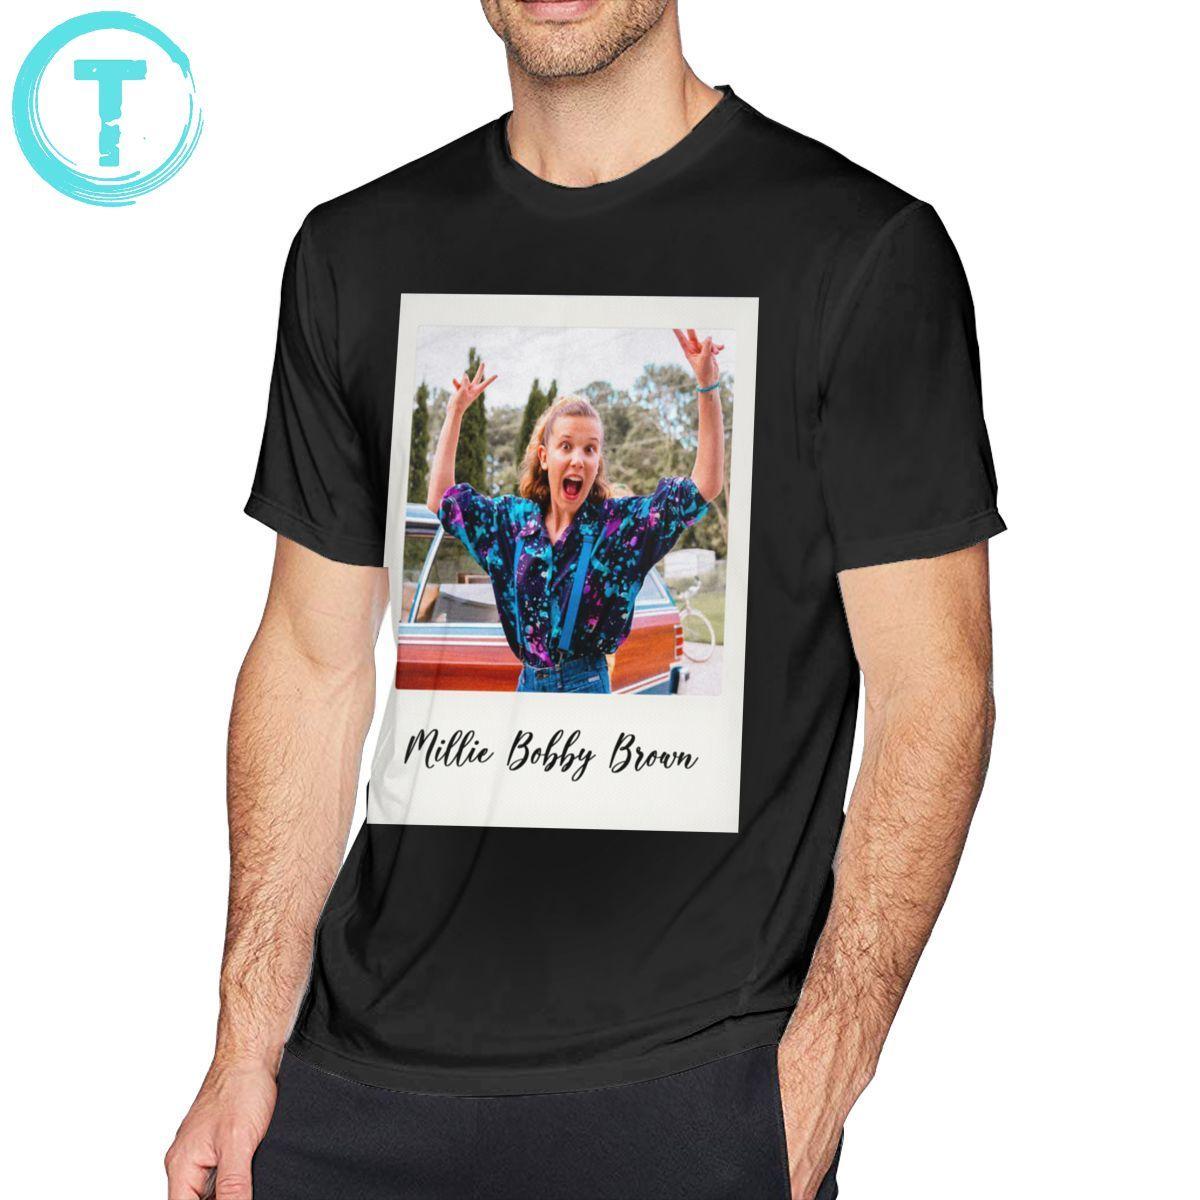 Millie Bobby Brown T Shirt Millie Bobby Brown Polaroid T-Shirt Basic Short Sleeves Tee Shirt Plus size  Tshirt